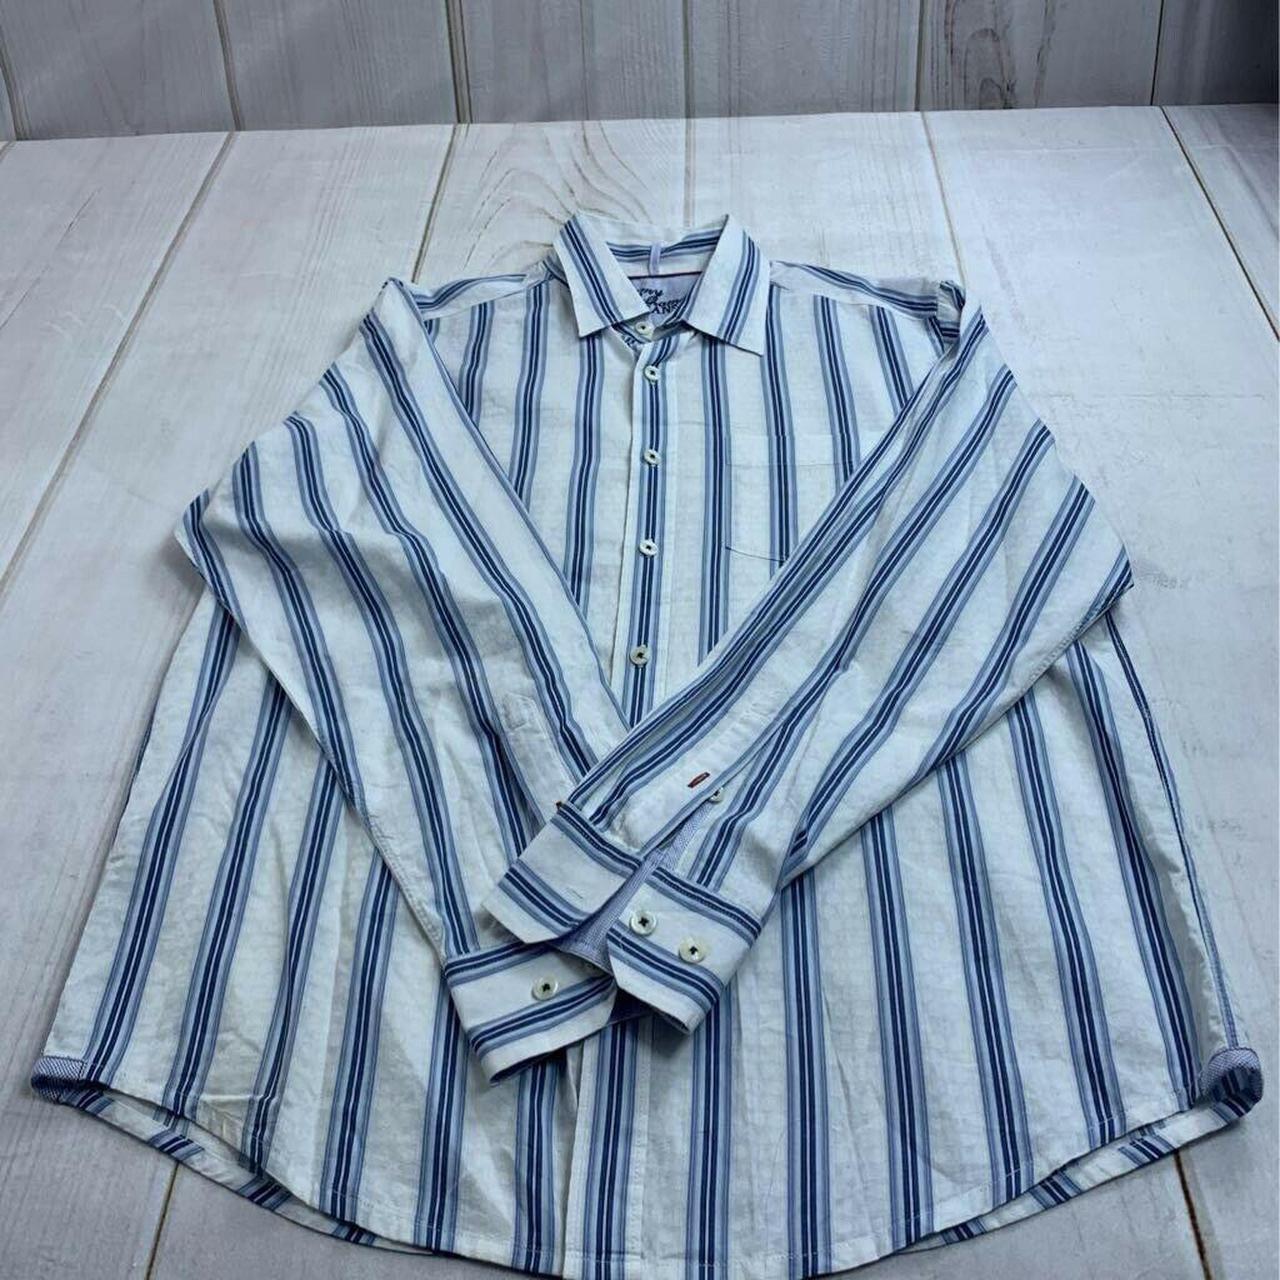 Product Image 1 - Tommy Bahama Jeans Men's L